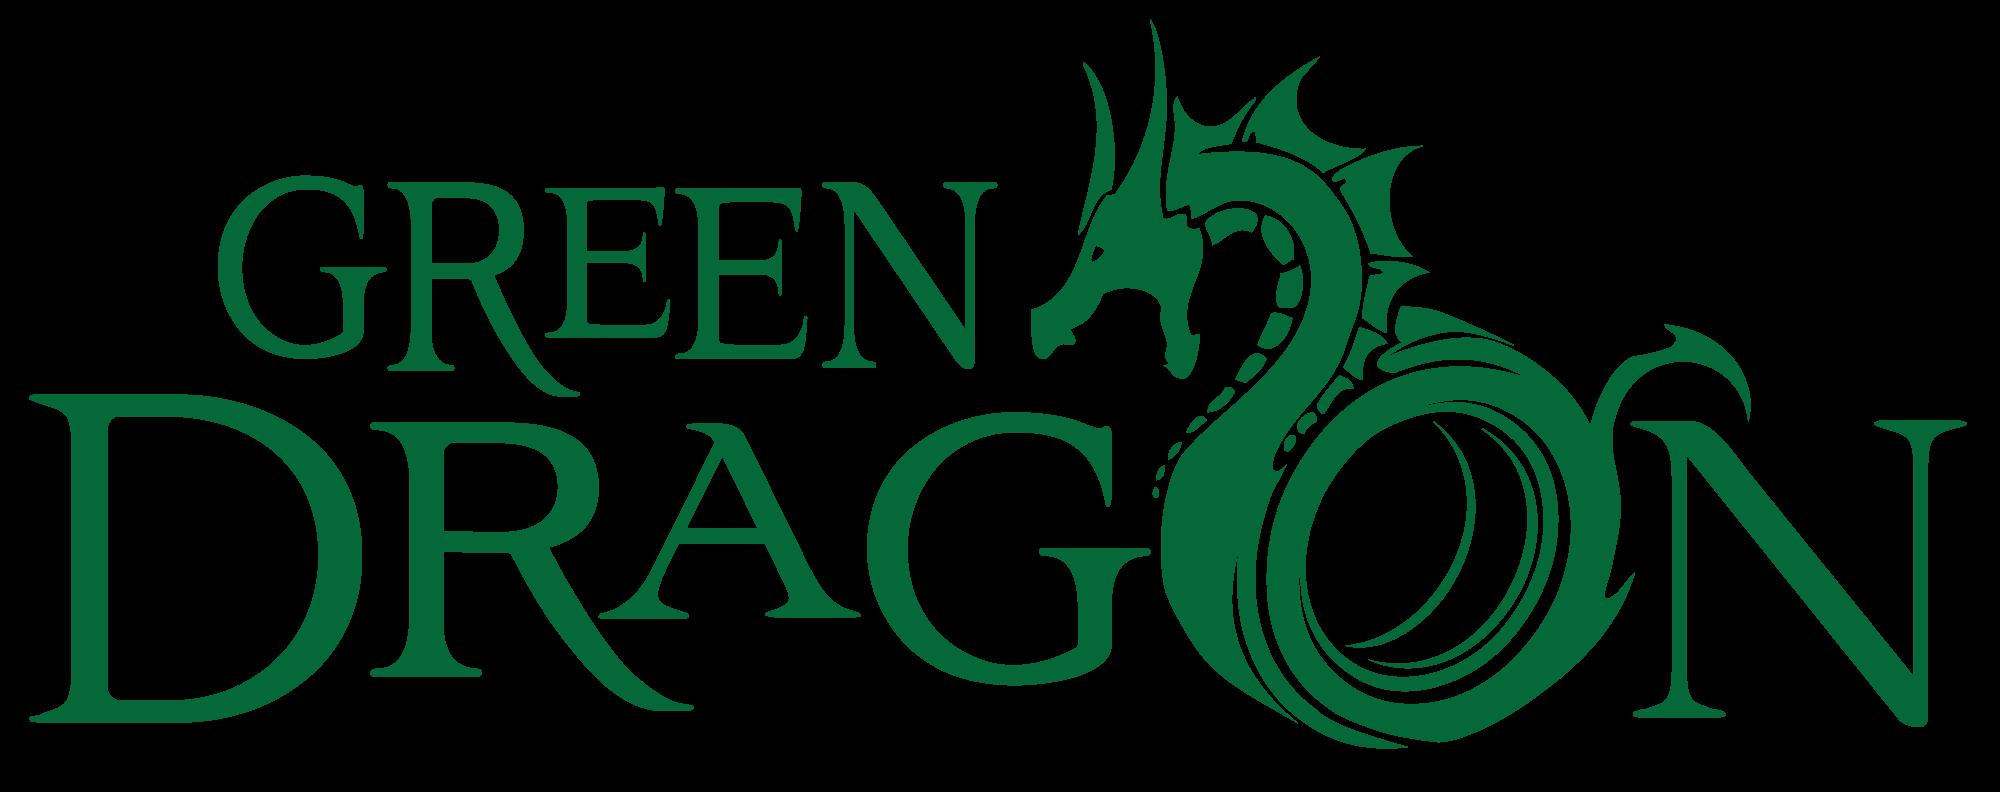 Pics For Gt Green Dragon Logo Green Dragon Green Name Logo